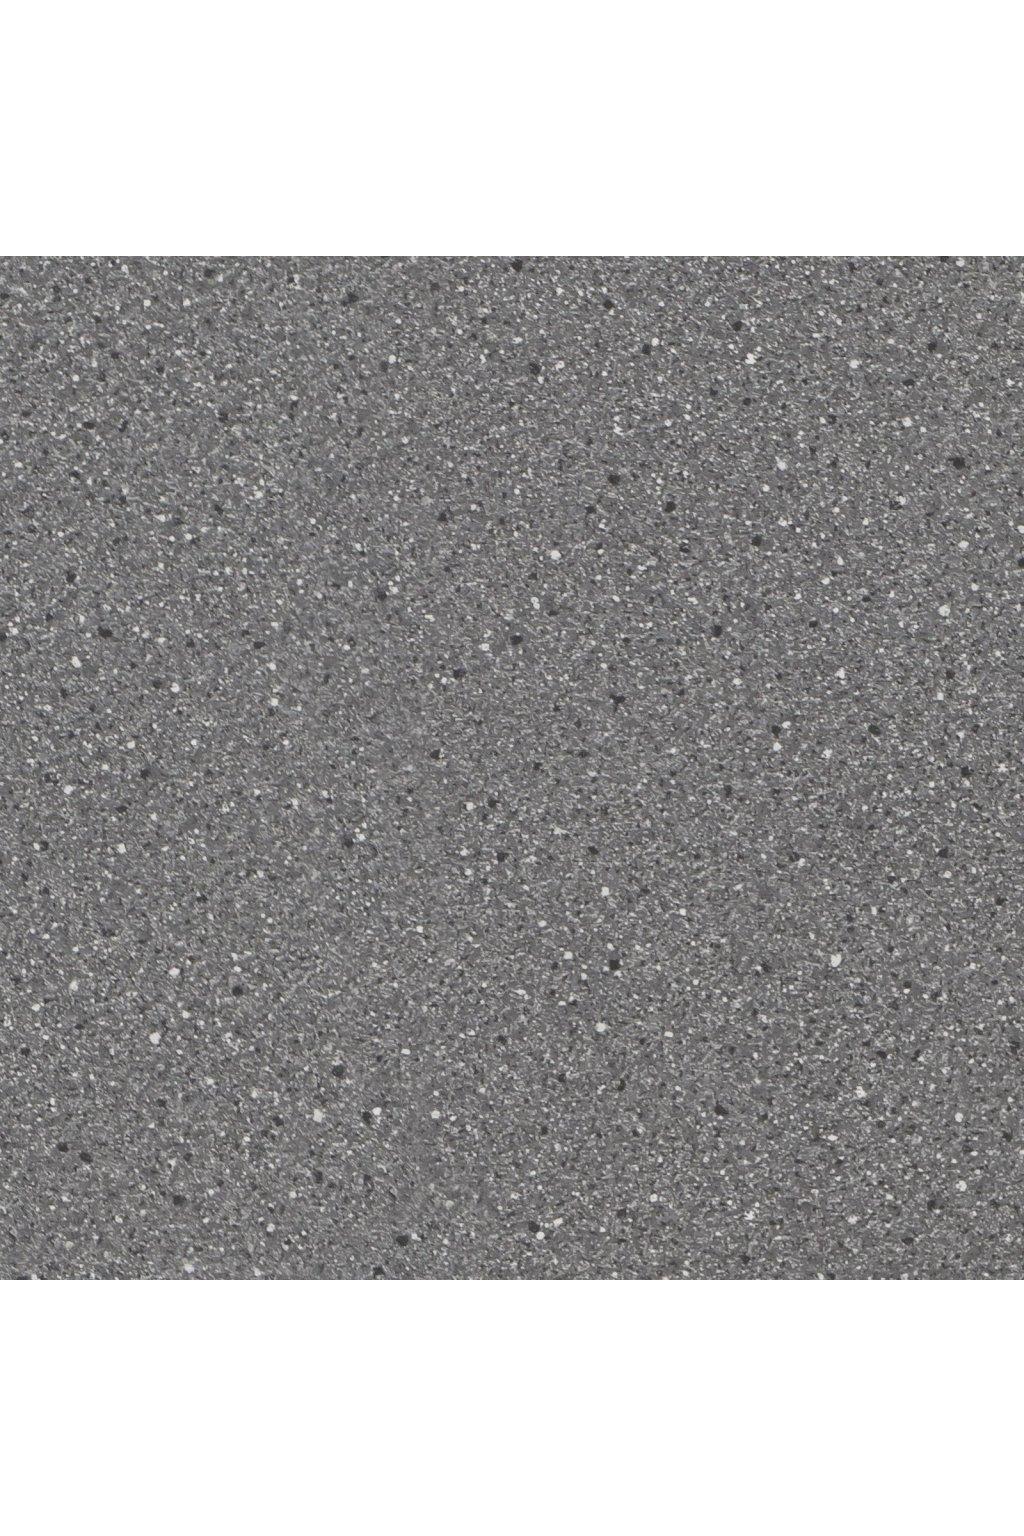 Pracovní deska Black Granite 38mm